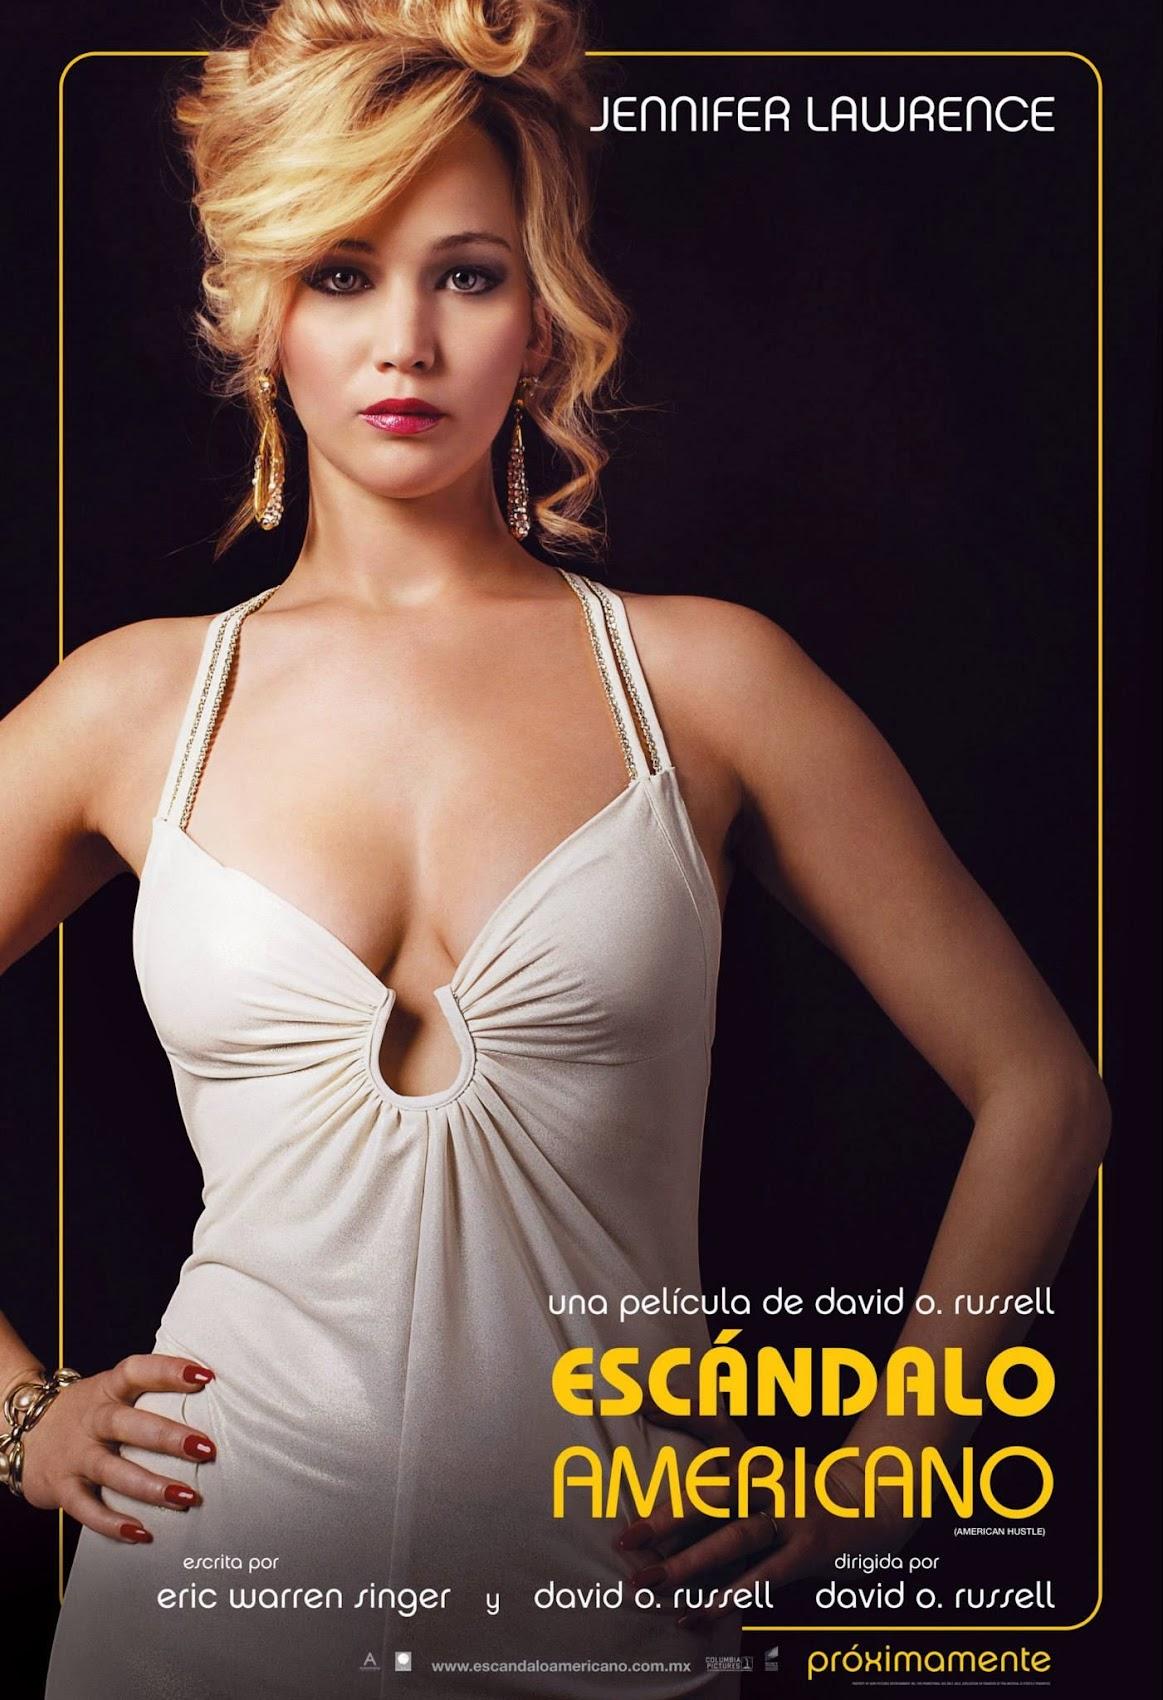 http://1.bp.blogspot.com/-vYYtFtTMkSE/UmFQCJqBlVI/AAAAAAAAQ88/lzuz2ia3r1U/s1700/Escandalo_Americano_Poster_Individual_Latino_Oficial_e_JPosters.jpg